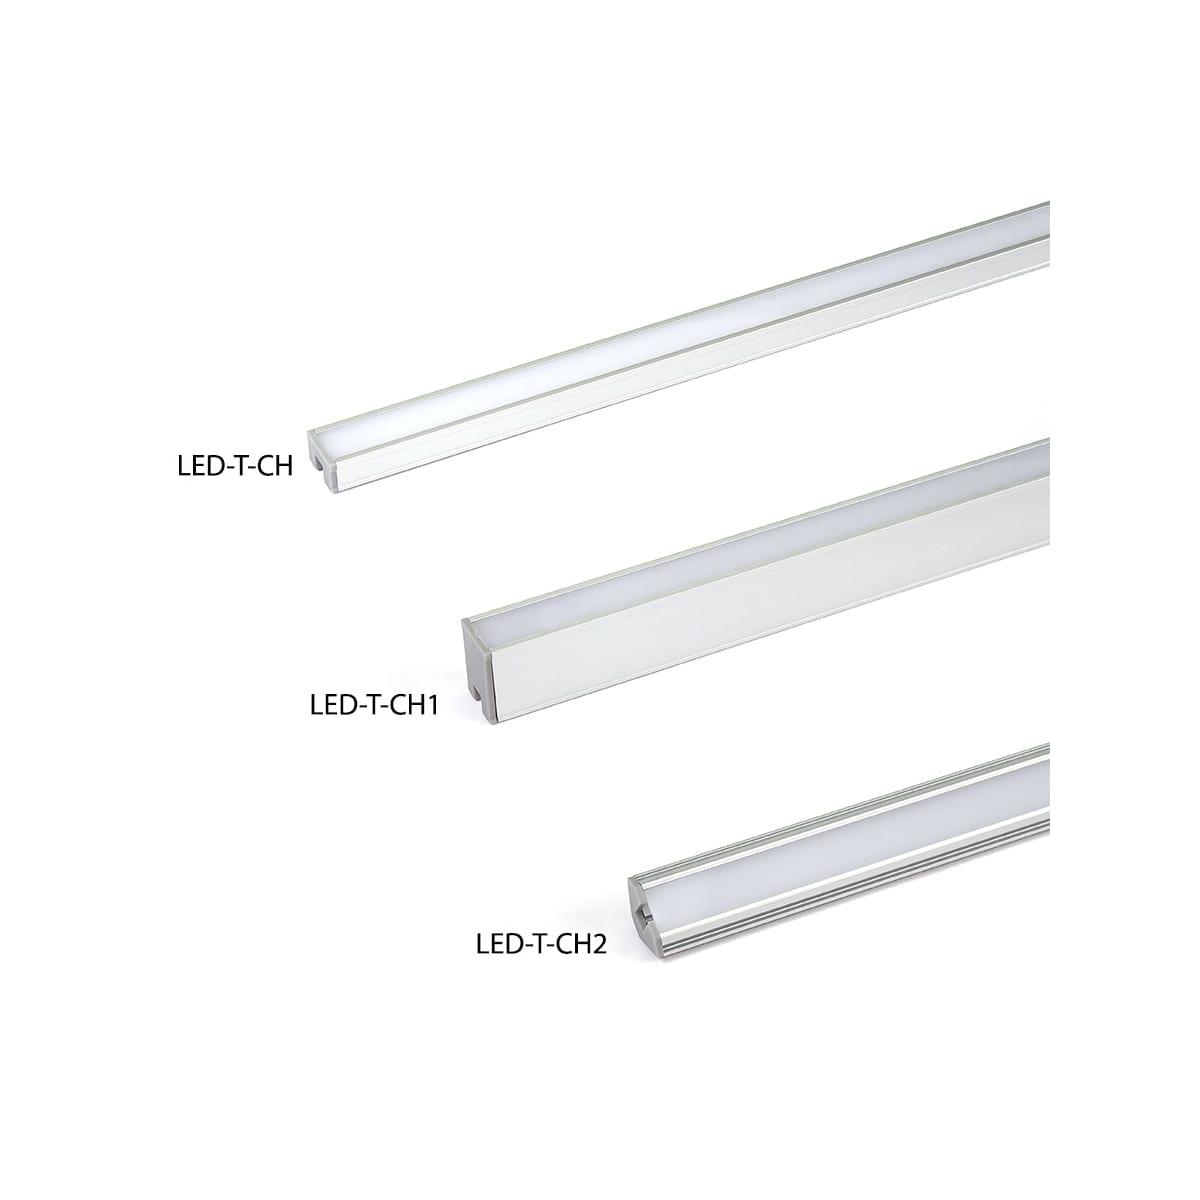 WAC Lighting LED-T-CH